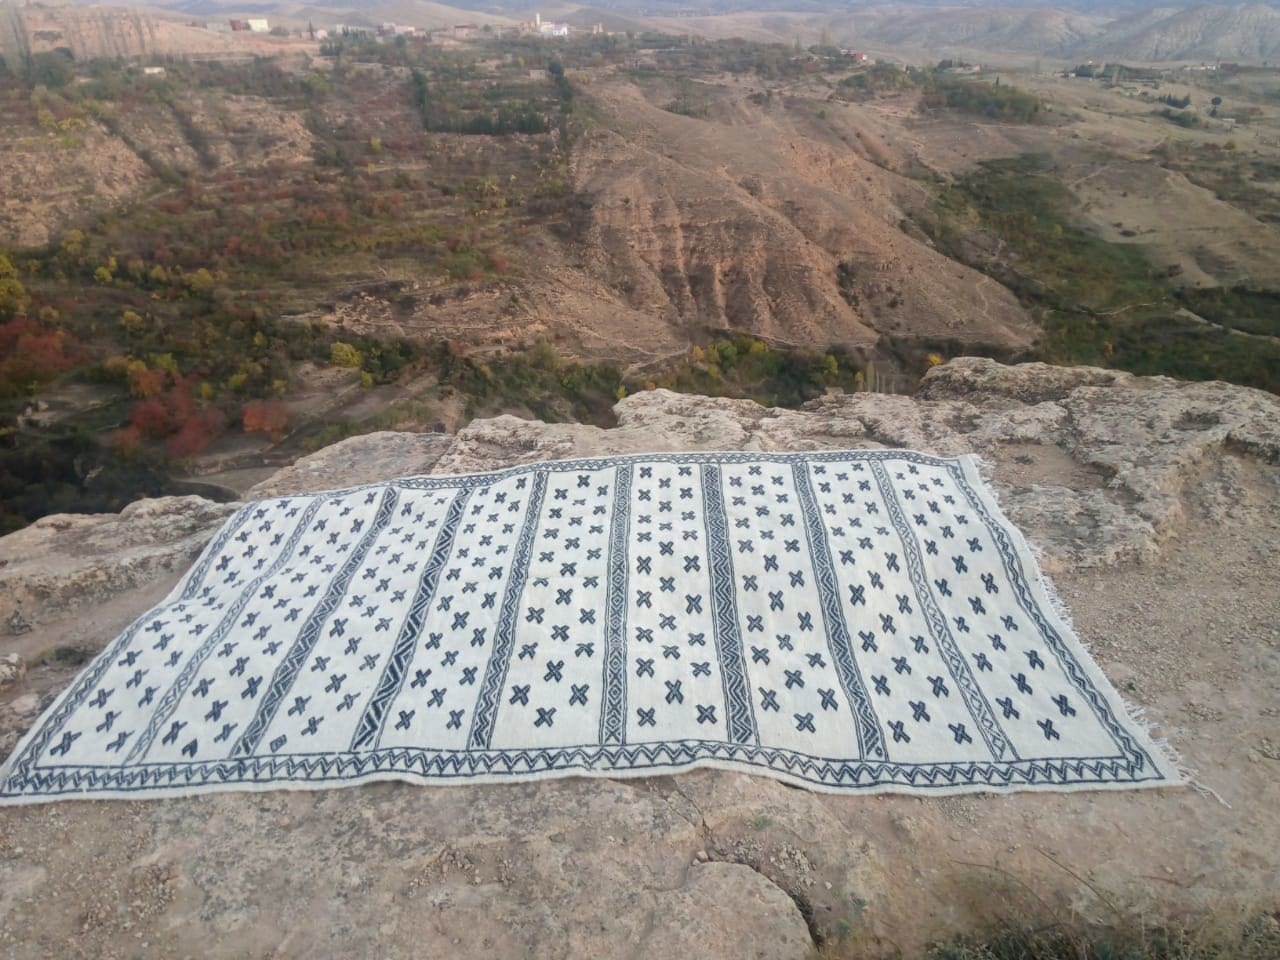 Flatweave the Warp and Wool Black, White Morocco